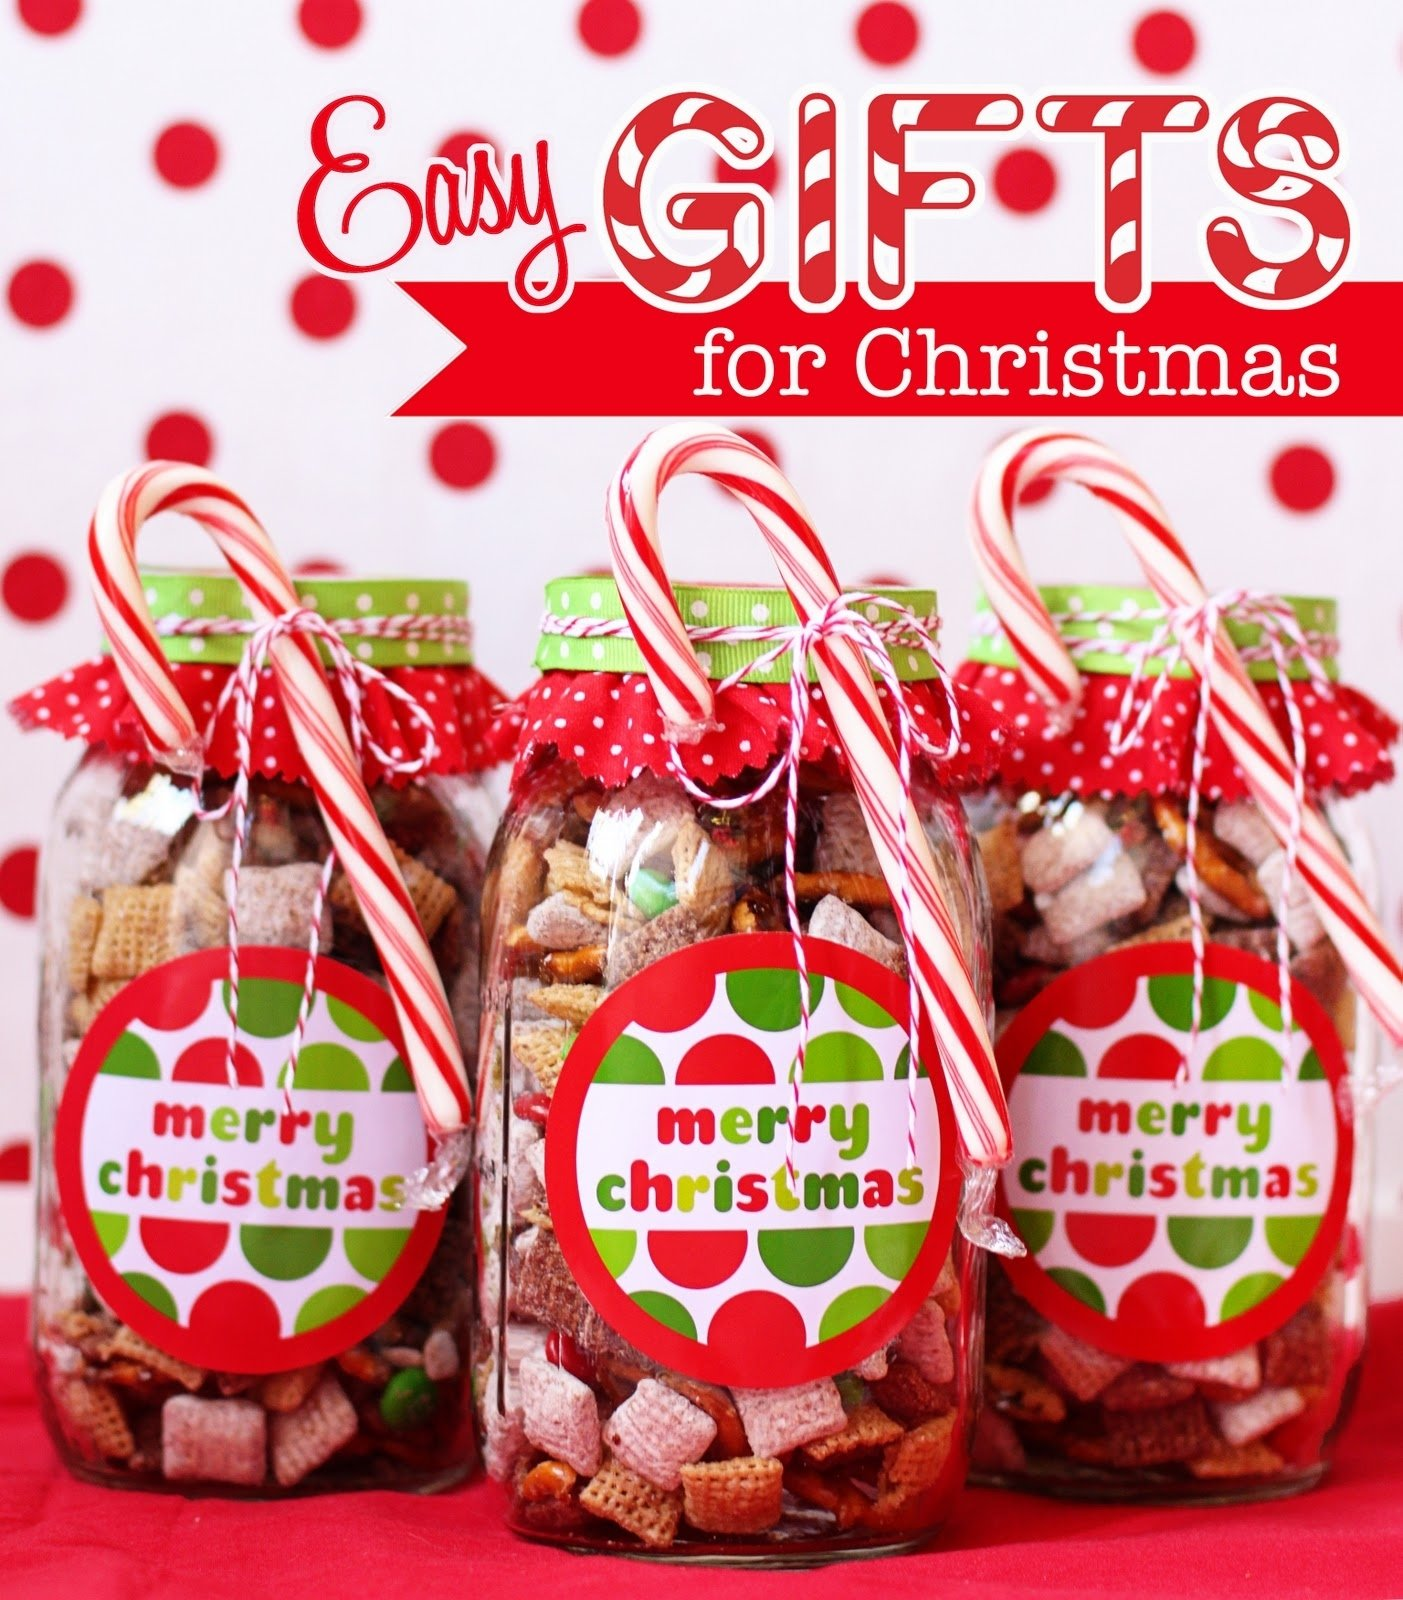 10 Stunning Christmas Gift Ideas For Kids To Make easy homemade christmas gifts for kids loversiq 2 2021